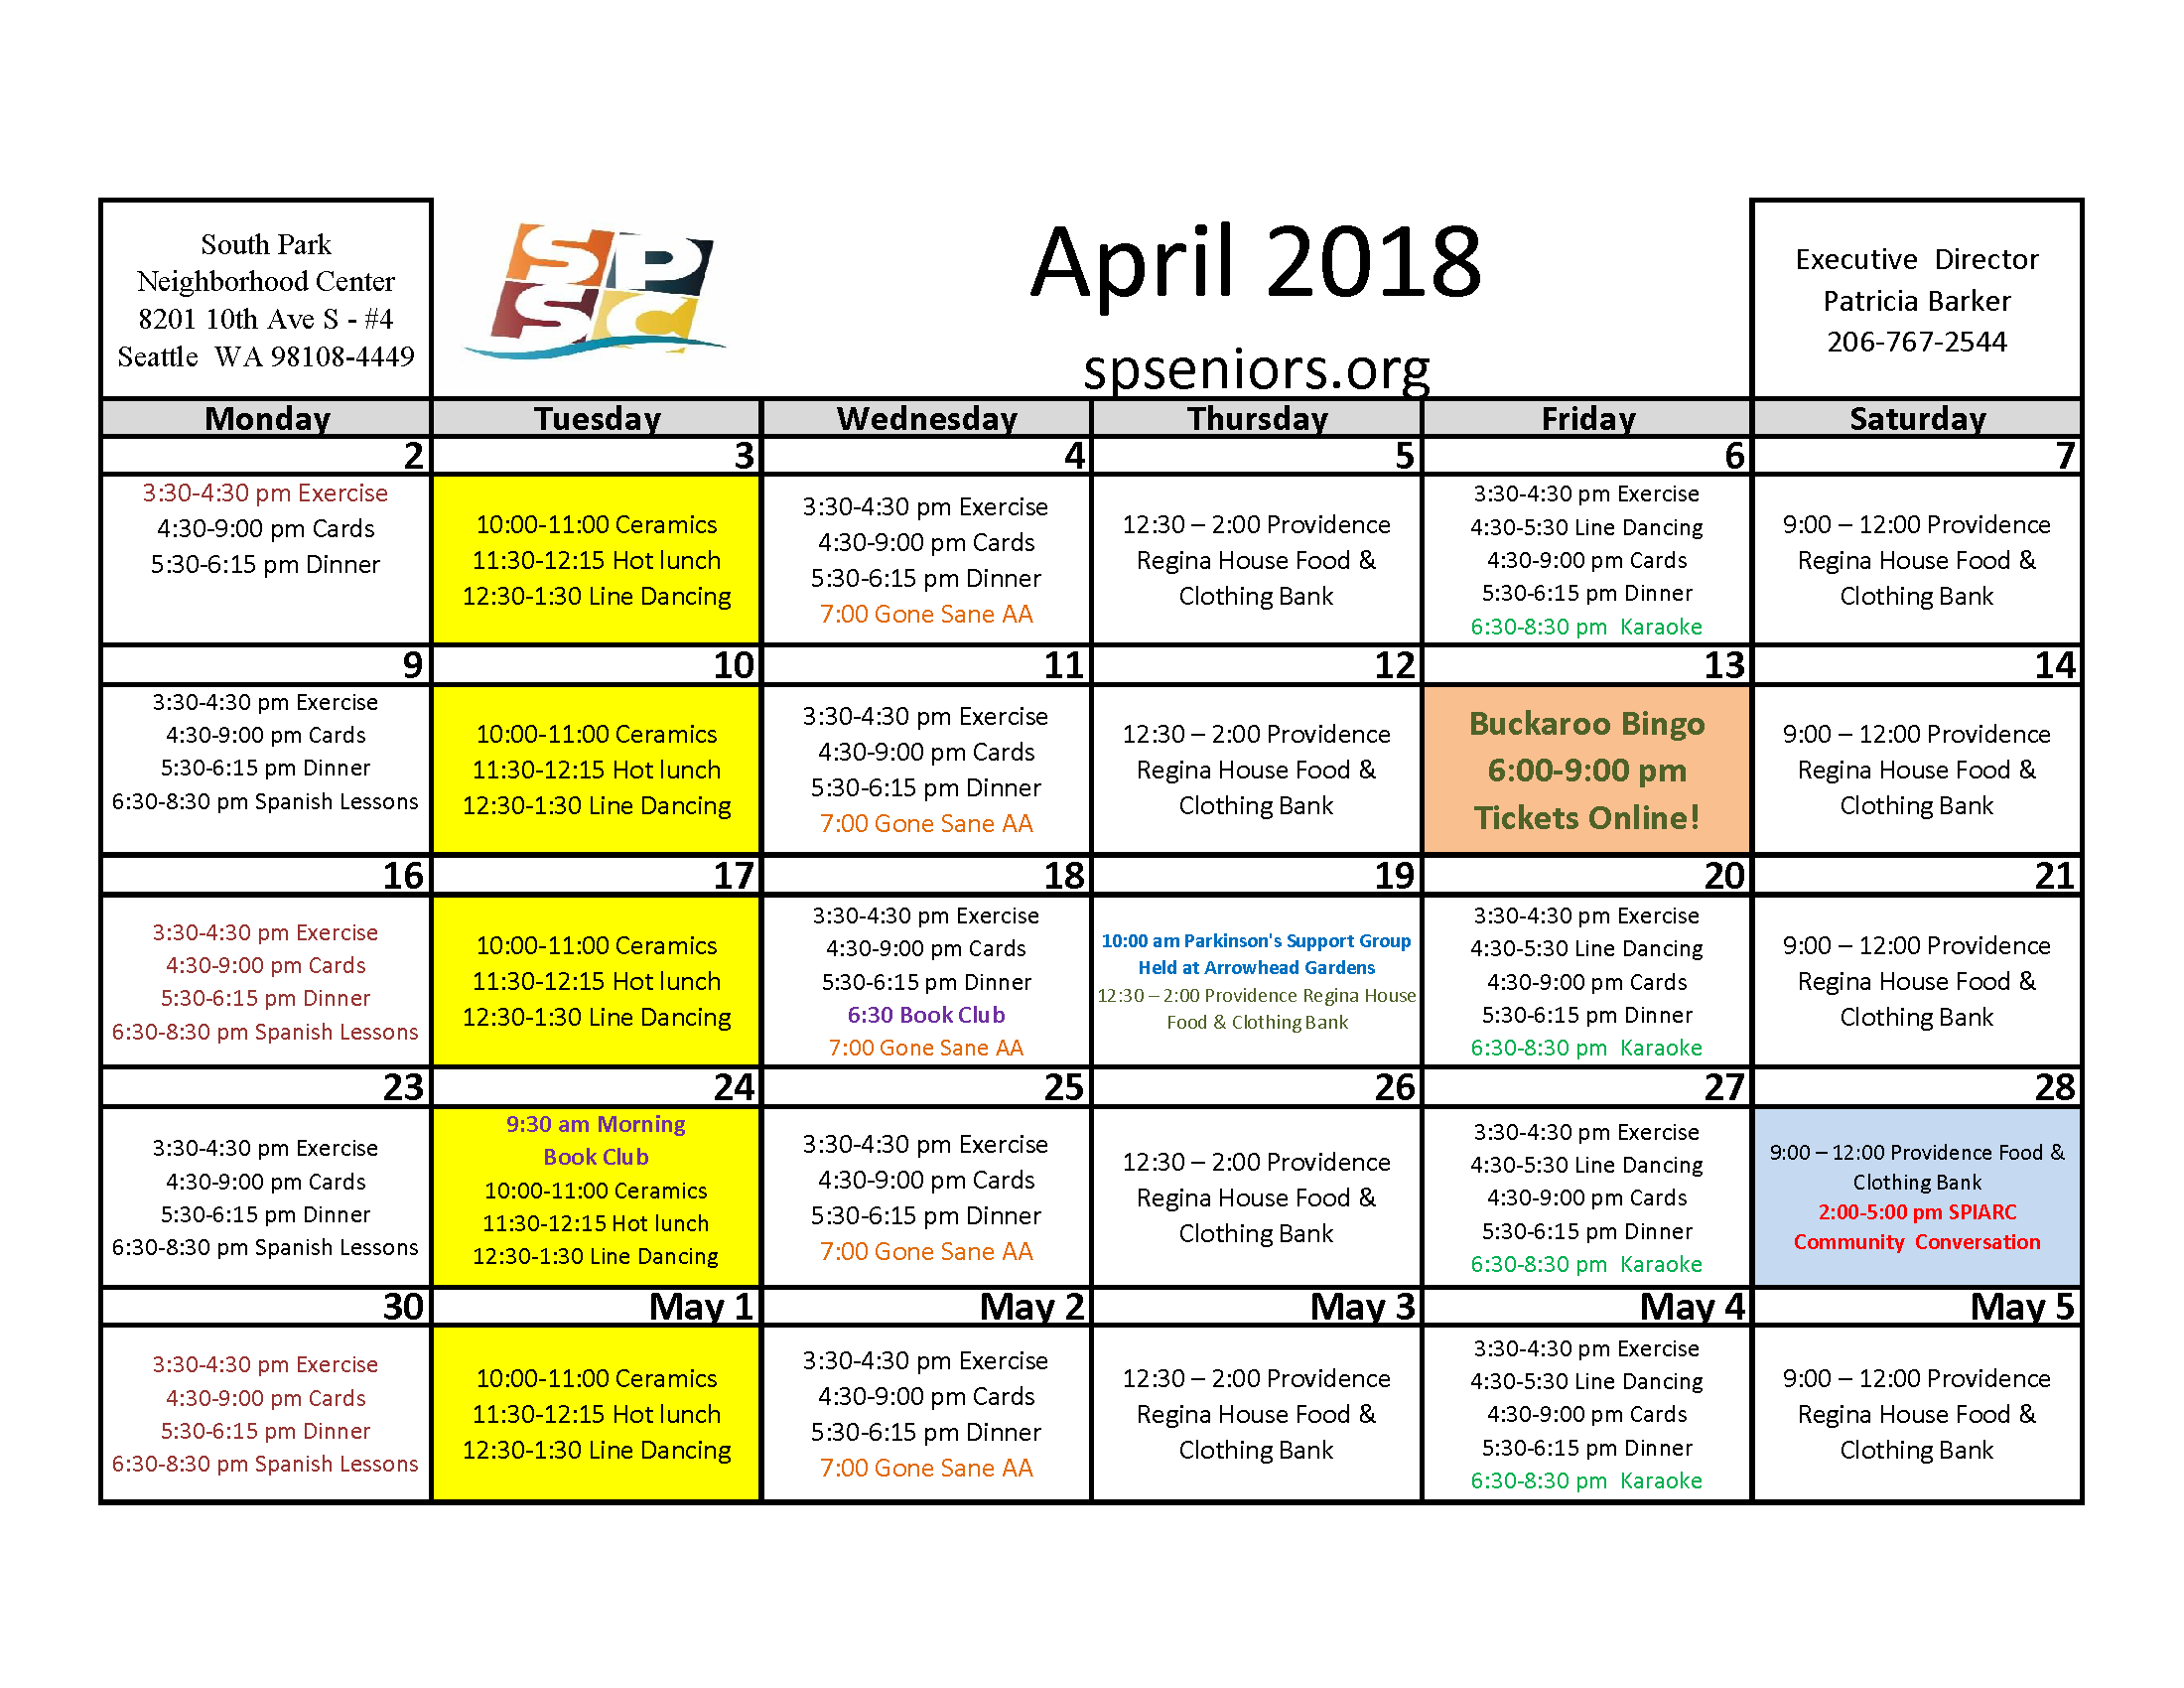 April activity Calendar for South Park Senior Citizens